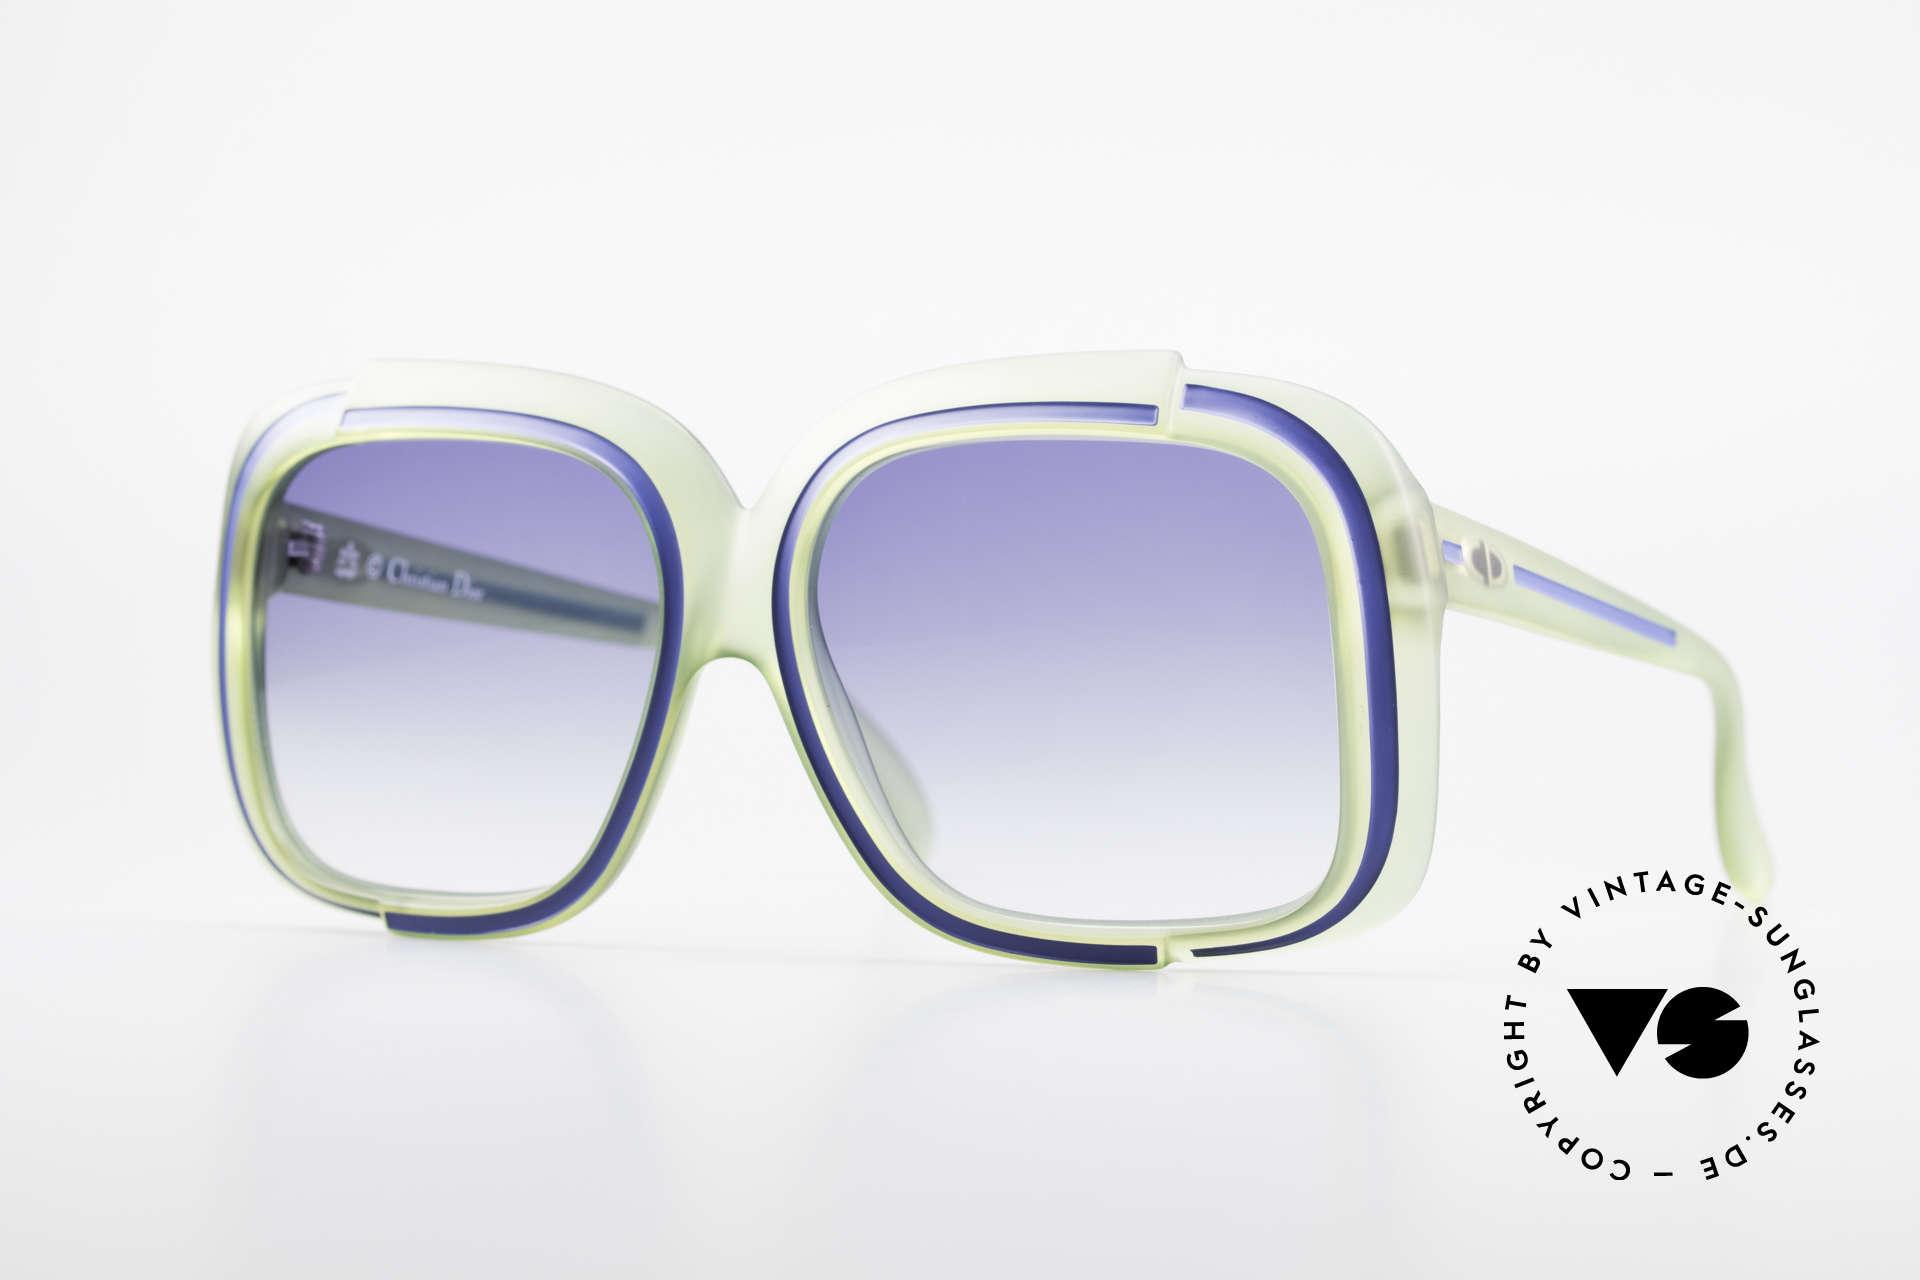 Christian Dior 2042 Rare Vintage Sunglasses 70's, magical Christian Dior designer sunglasses of the 70's, Made for Women